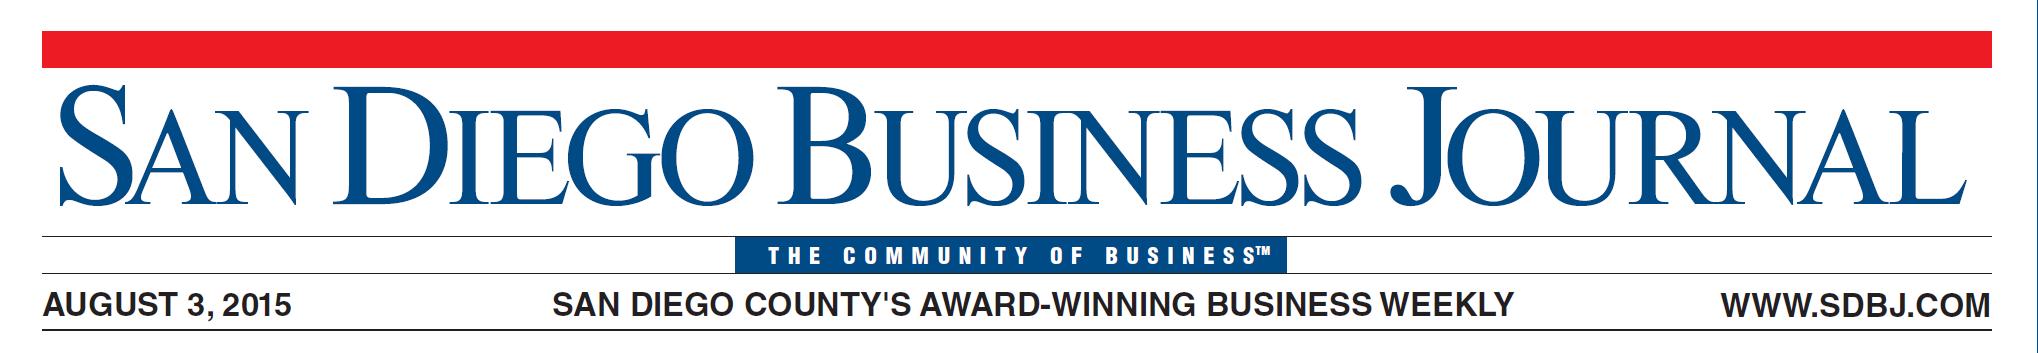 San-Diego-Business-Journal-Aug-3